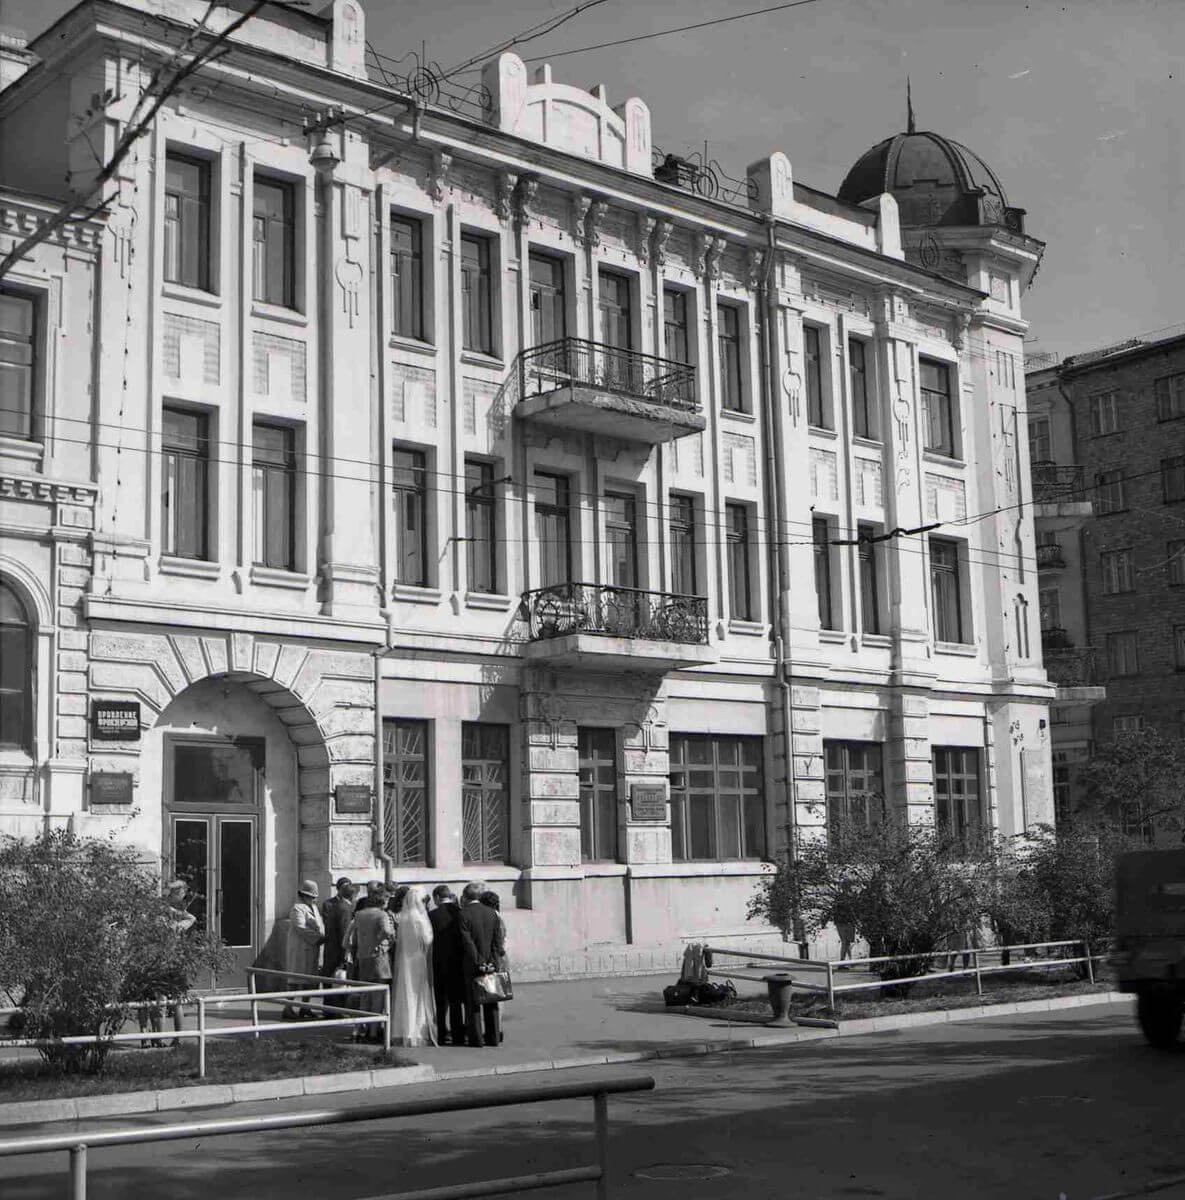 ЗАГС на улице Адмирала Фокина. 1970-е годы.